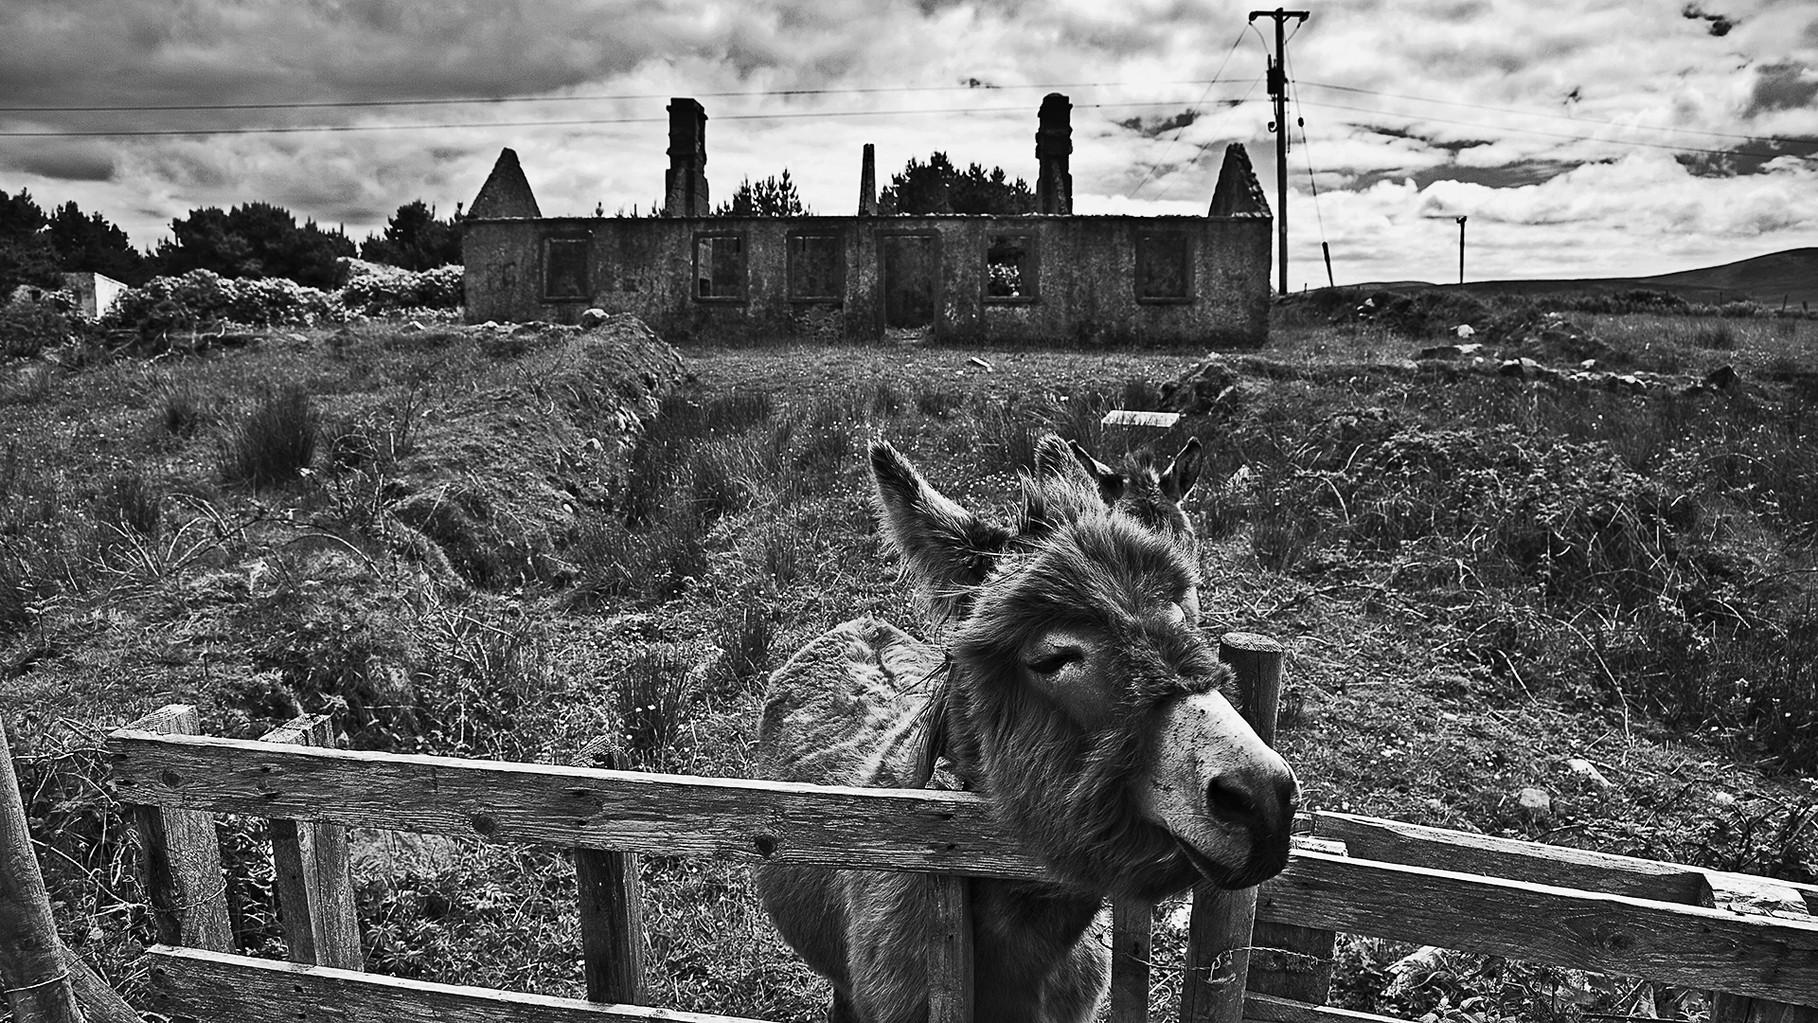 Home, sweet home - Donkey on Achill Island, County Mayo